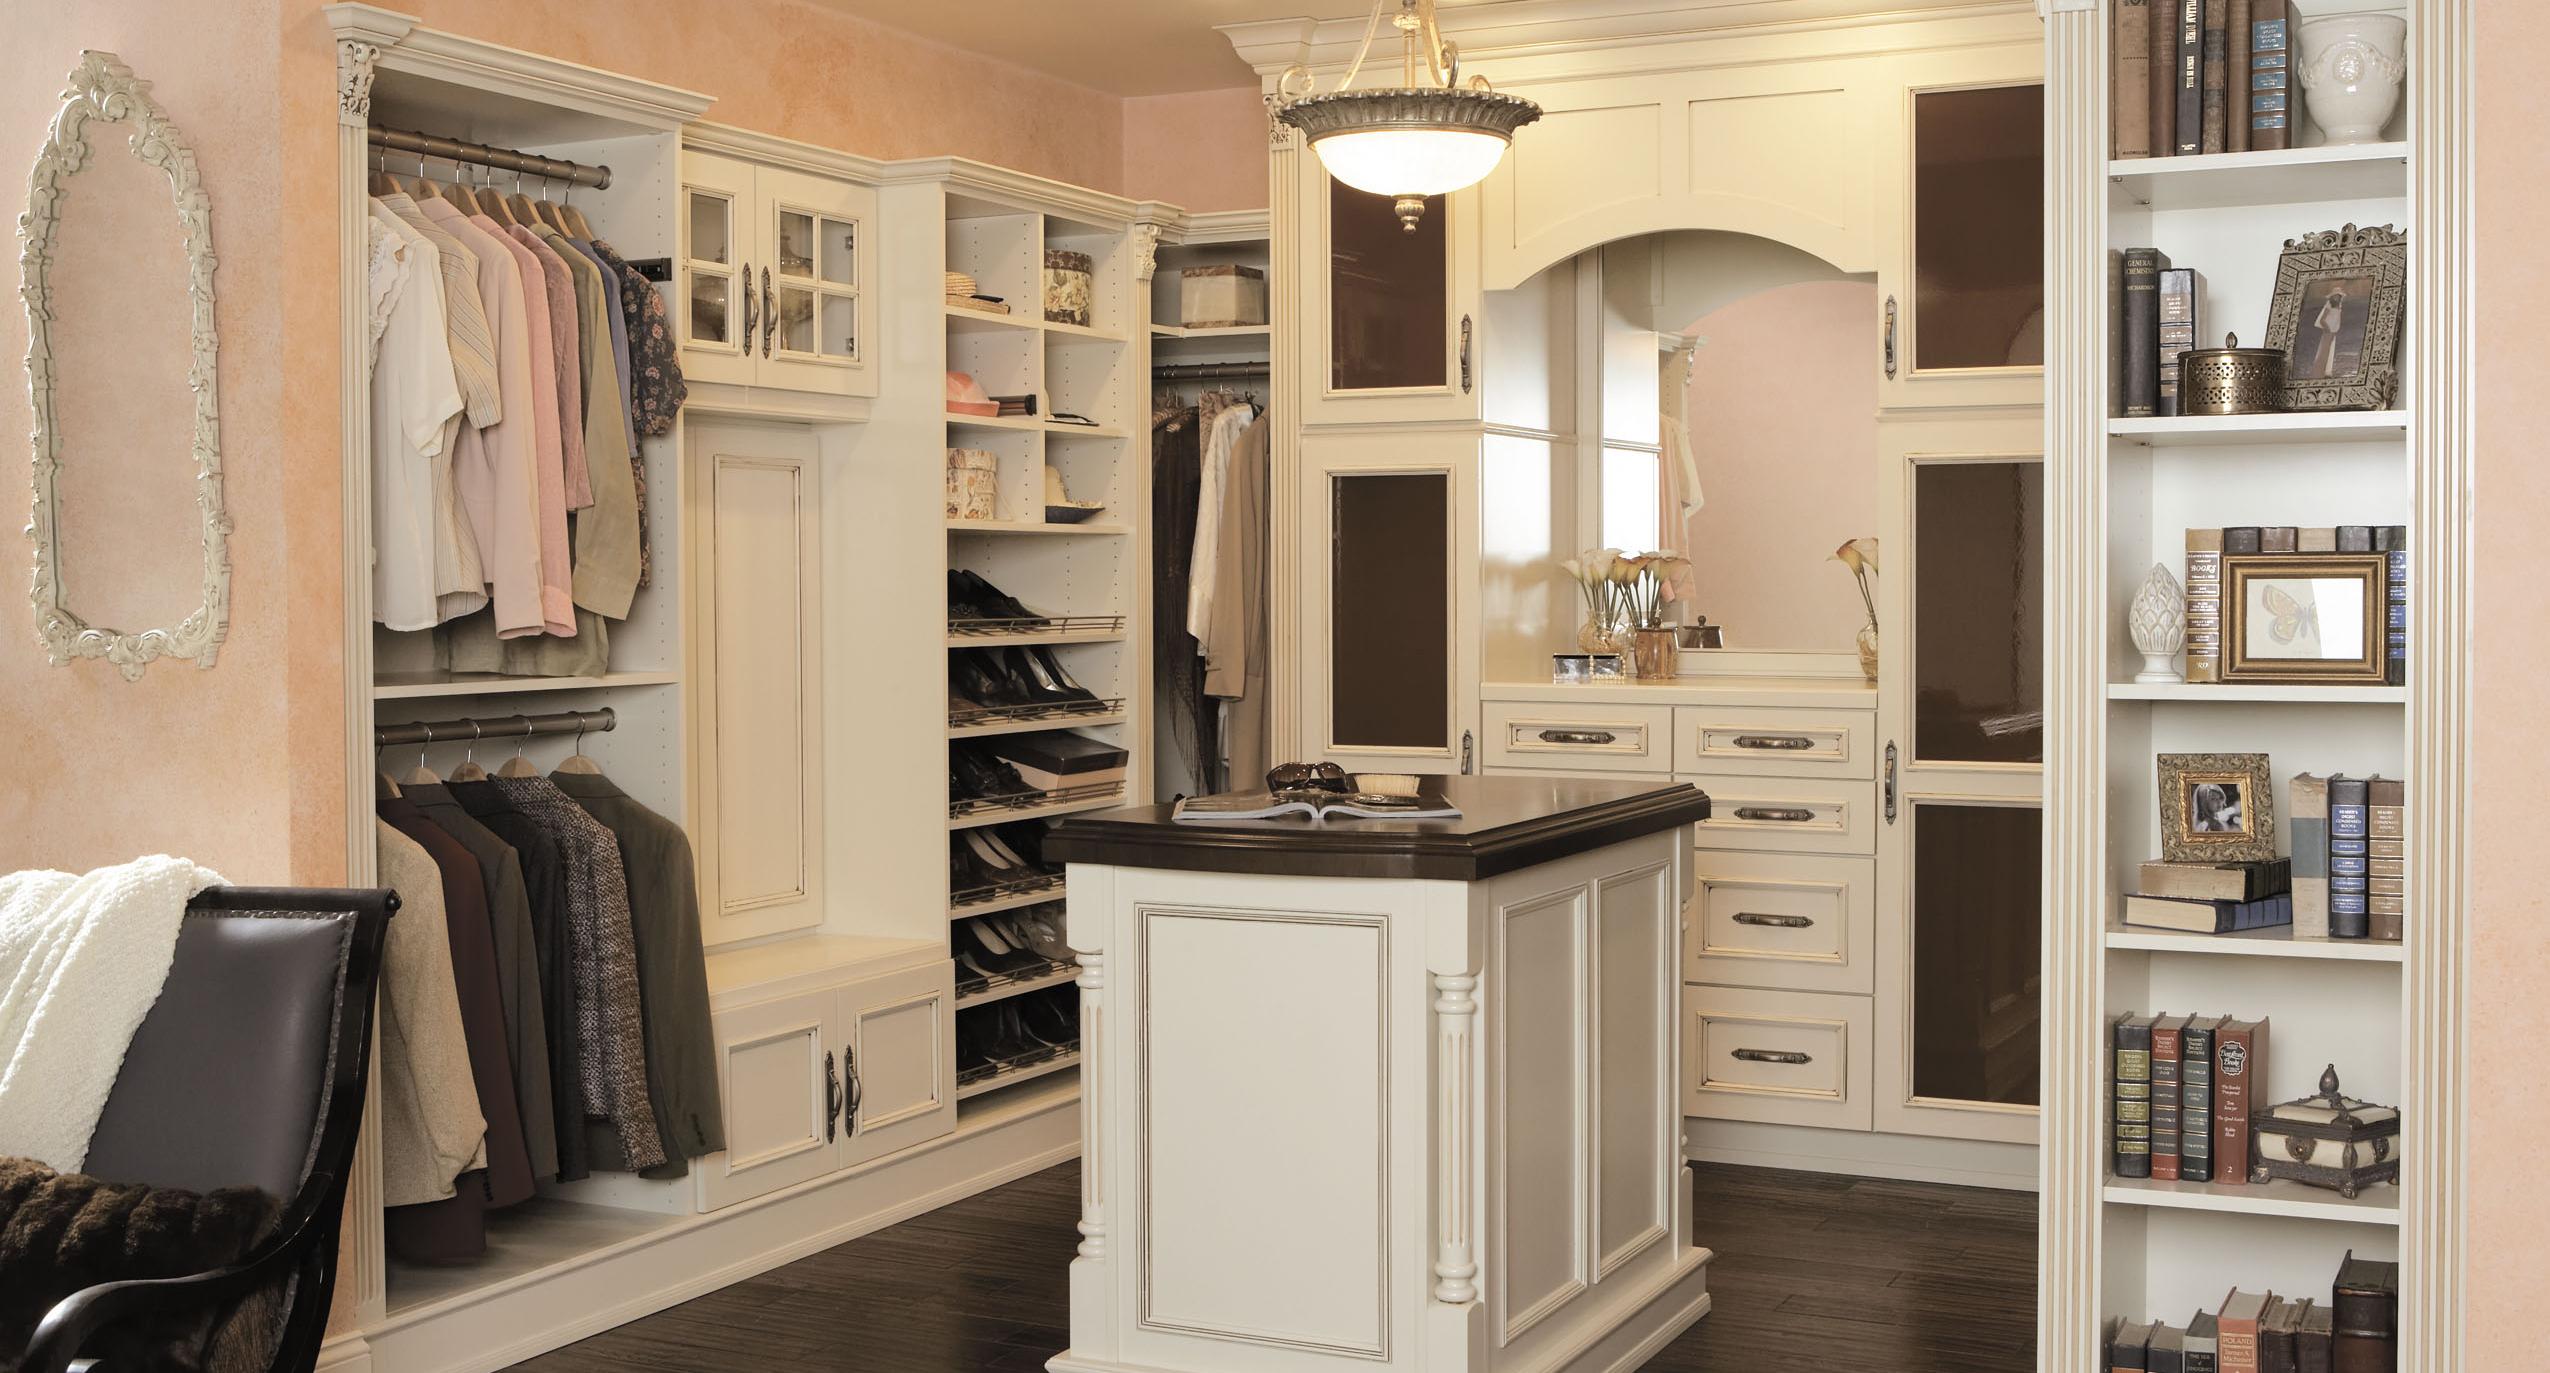 Mouser usa kitchens and baths manufacturer - Home Slider Background